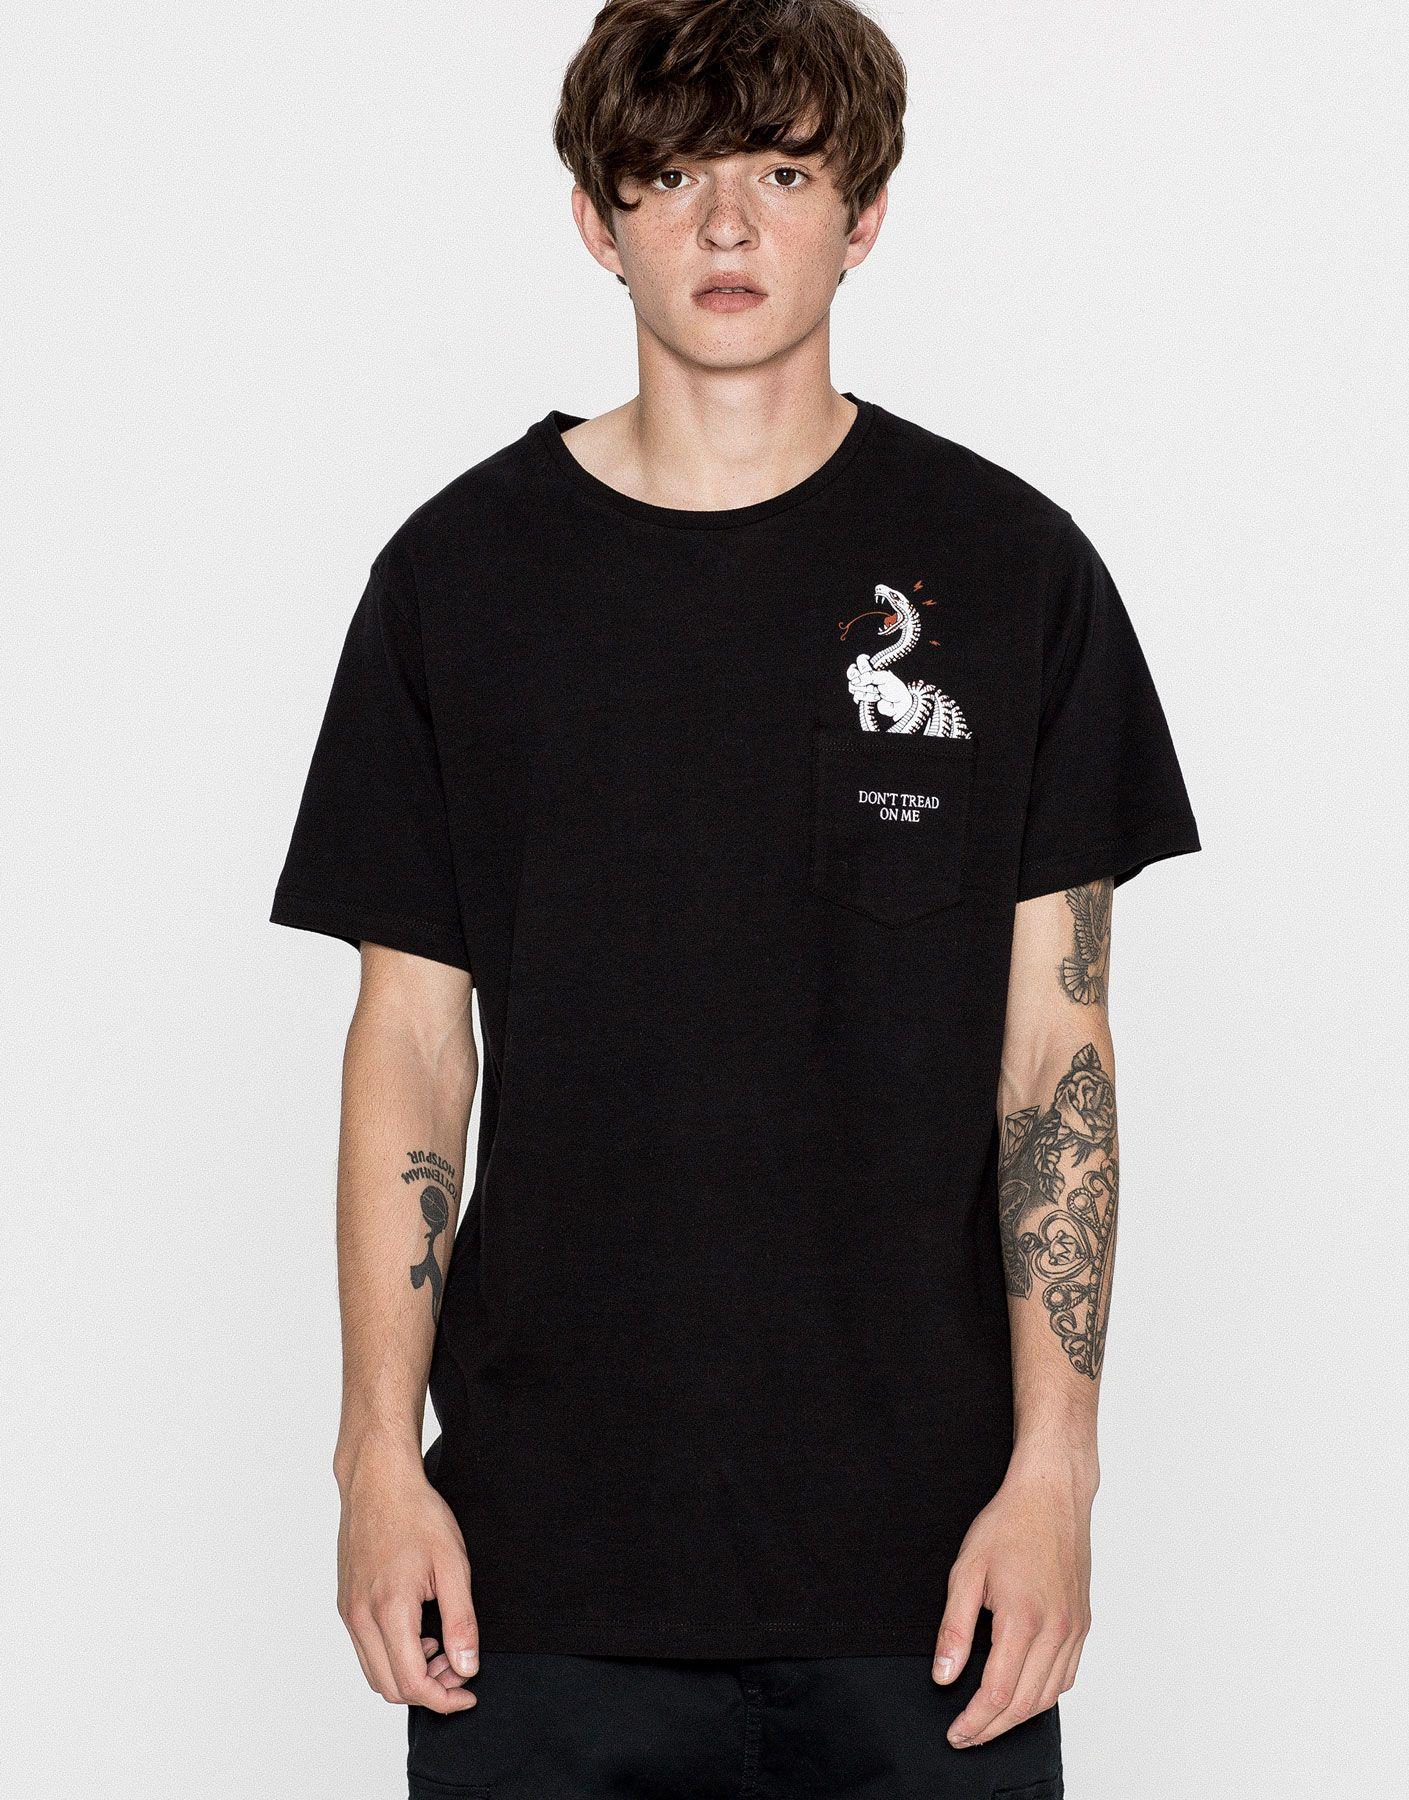 Camiseta print bolsillo serpiente - Camisetas - Ropa - Hombre - PULL&BEAR México